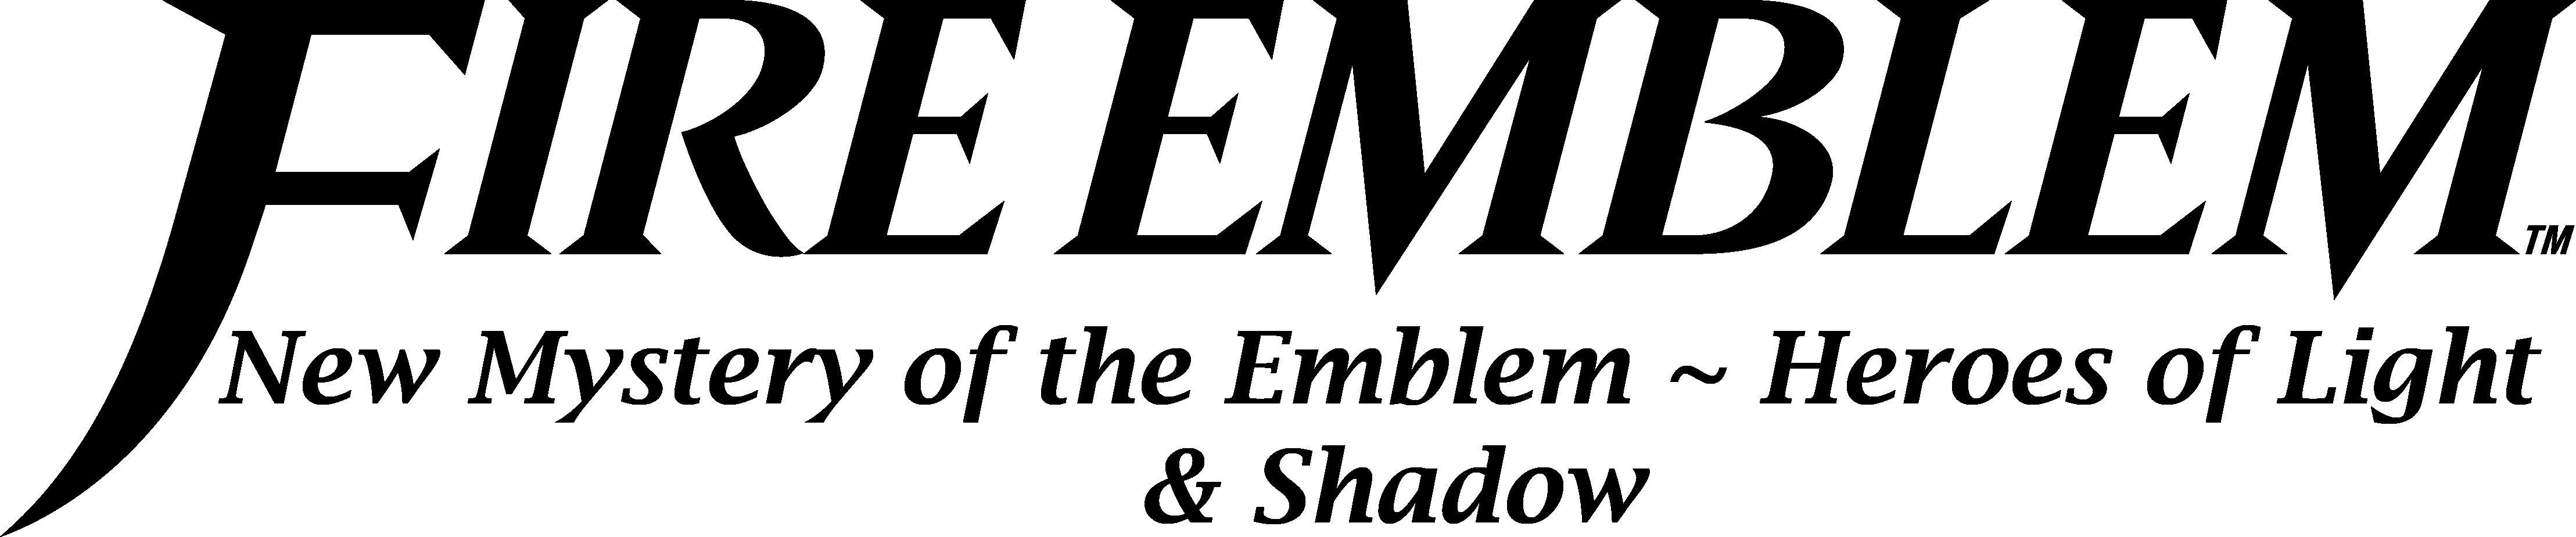 Fire Emblem New Mystery Of The Emblem English Logo By Ikamusumefan06 On Deviantart